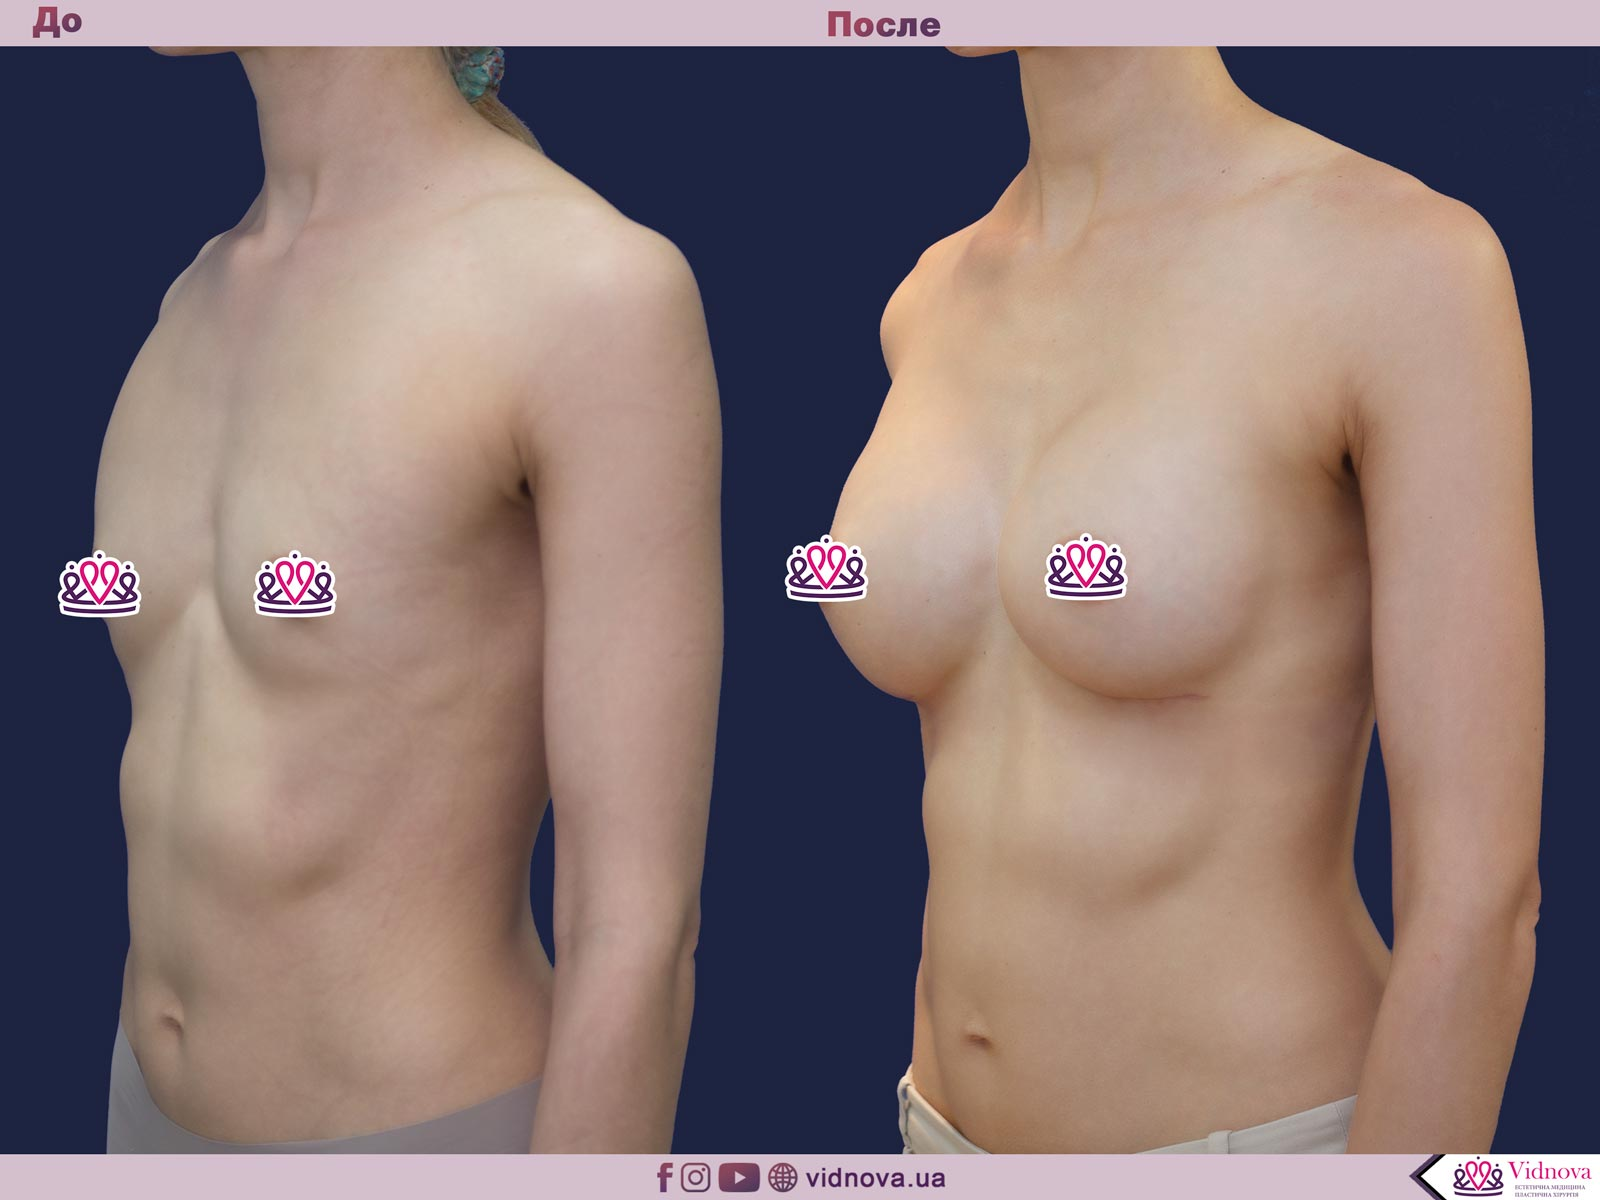 Увеличение груди: Фото ДО и ПОСЛЕ - Пример №58-2 - Клиника Vidnova